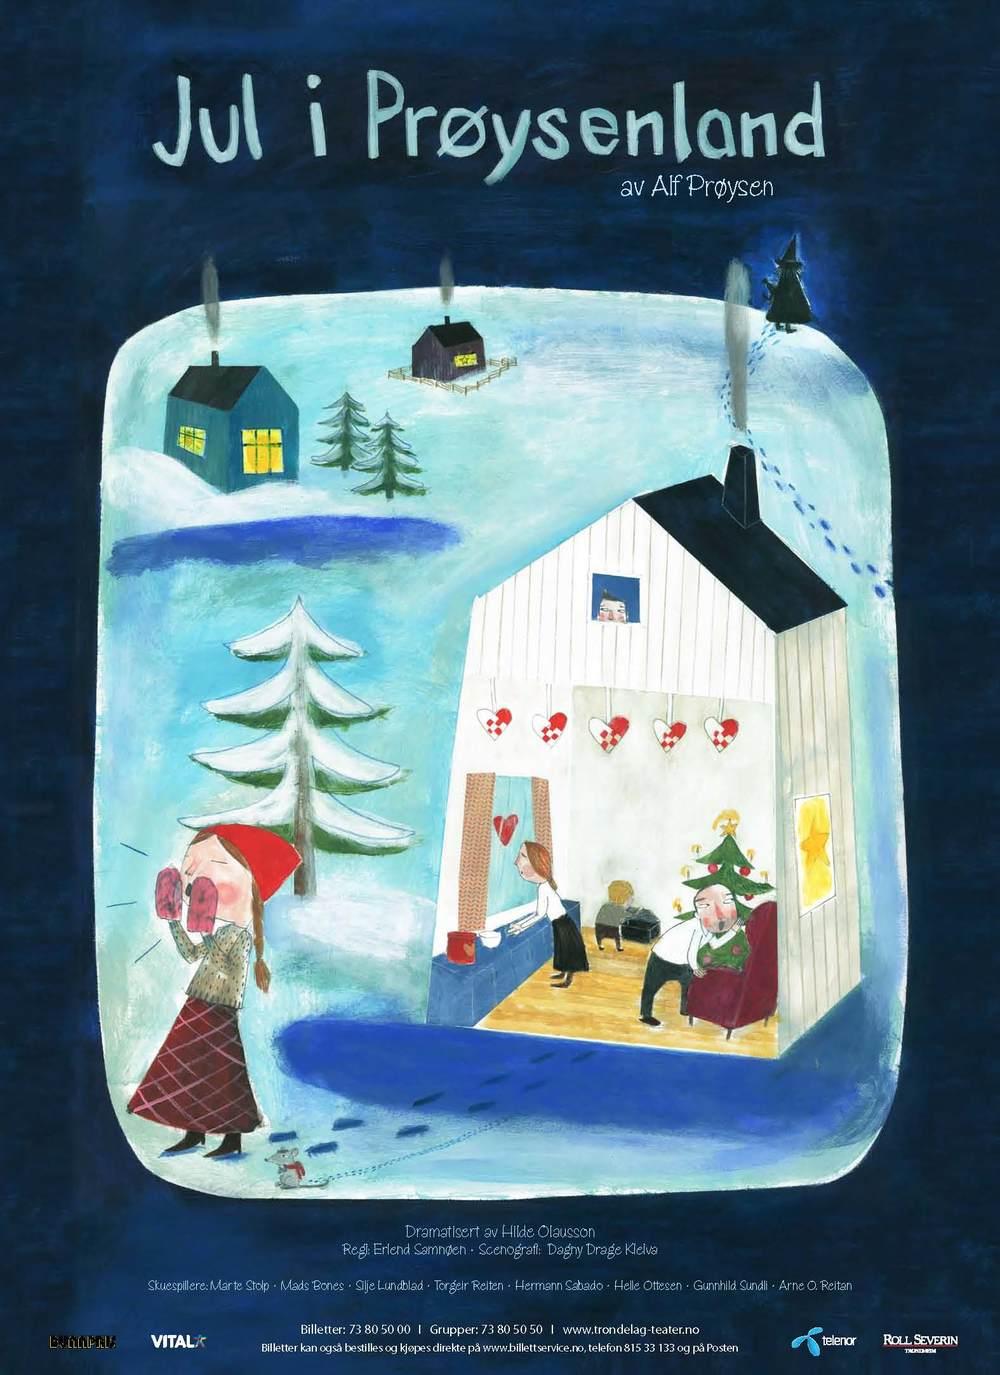 Plakat/Prøysenland, en juleforestilling spilt på Trøndelag Teater 2008-2012 Dialogue/Trøndelag Teater 2008